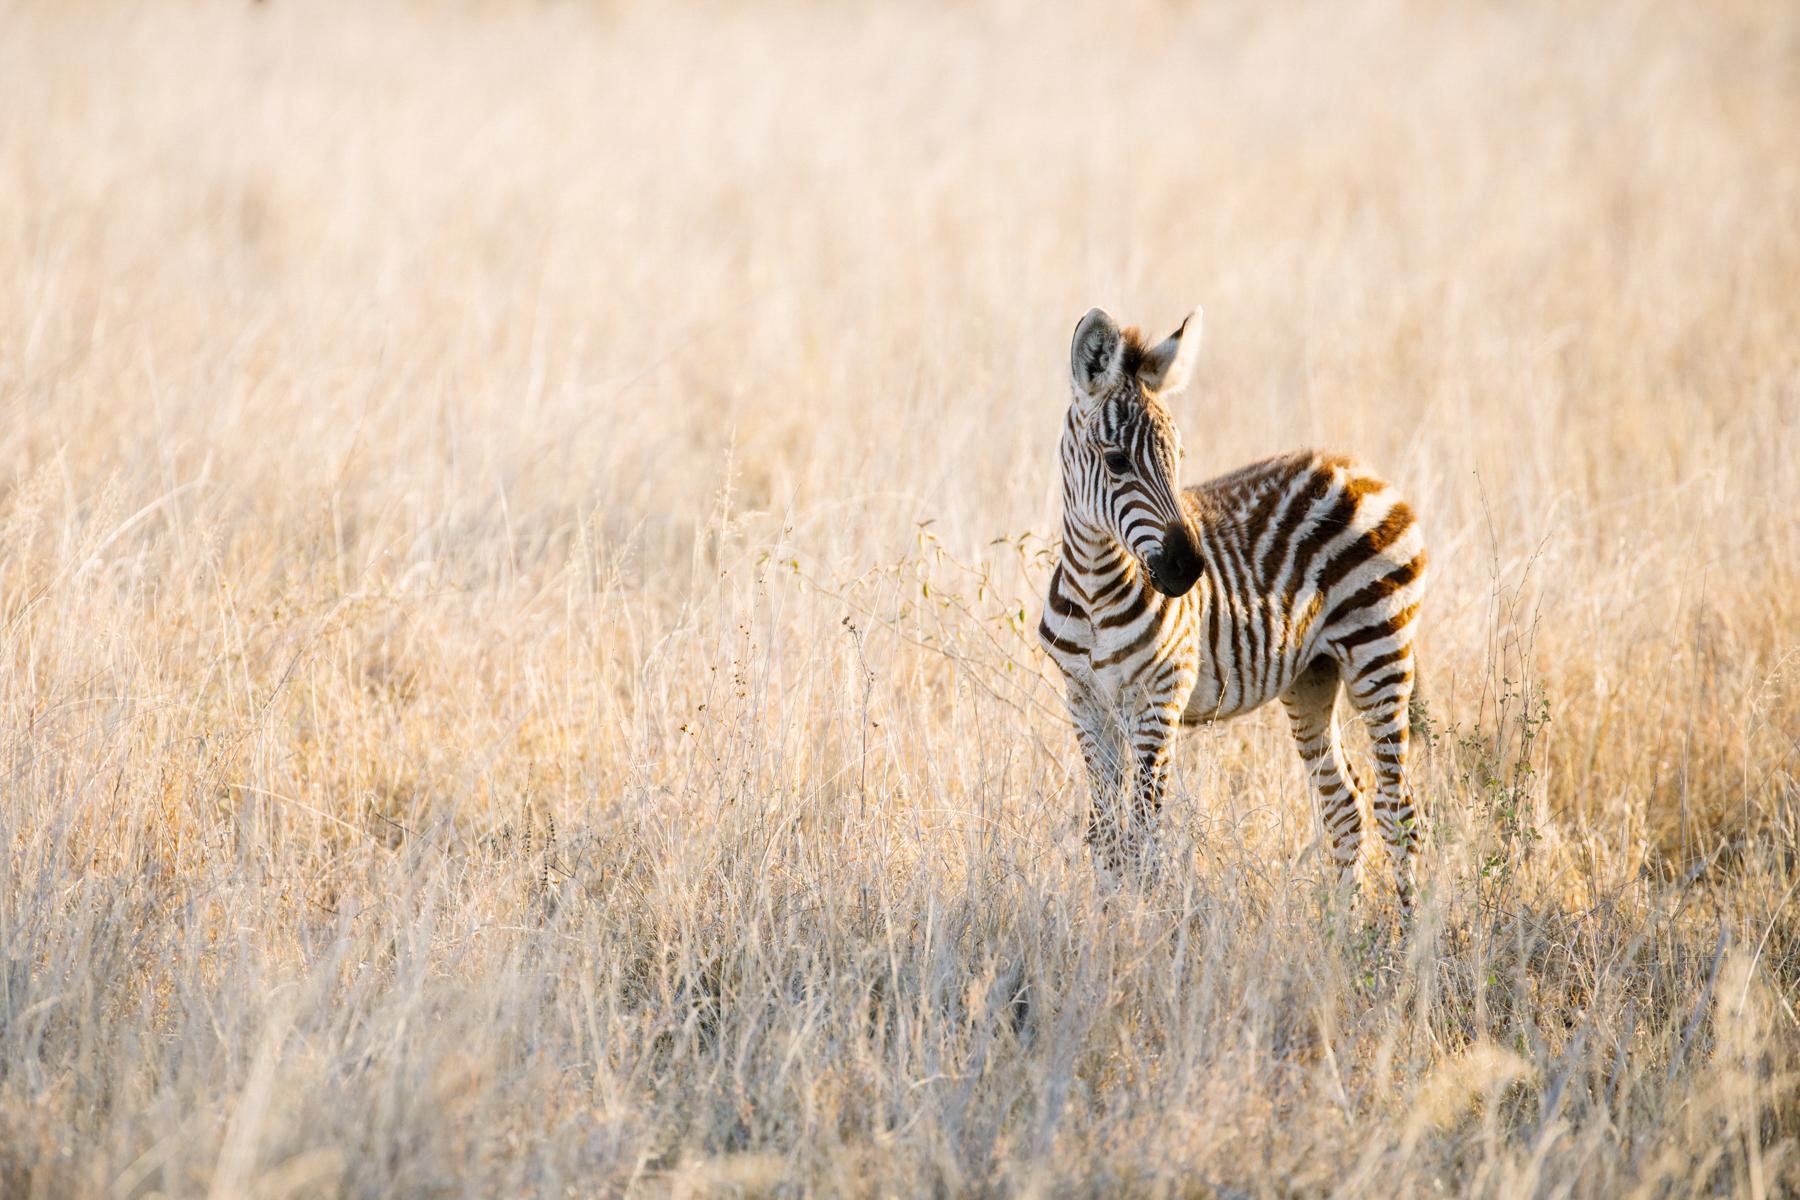 KenyaFeb2019_Safari-115.jpg